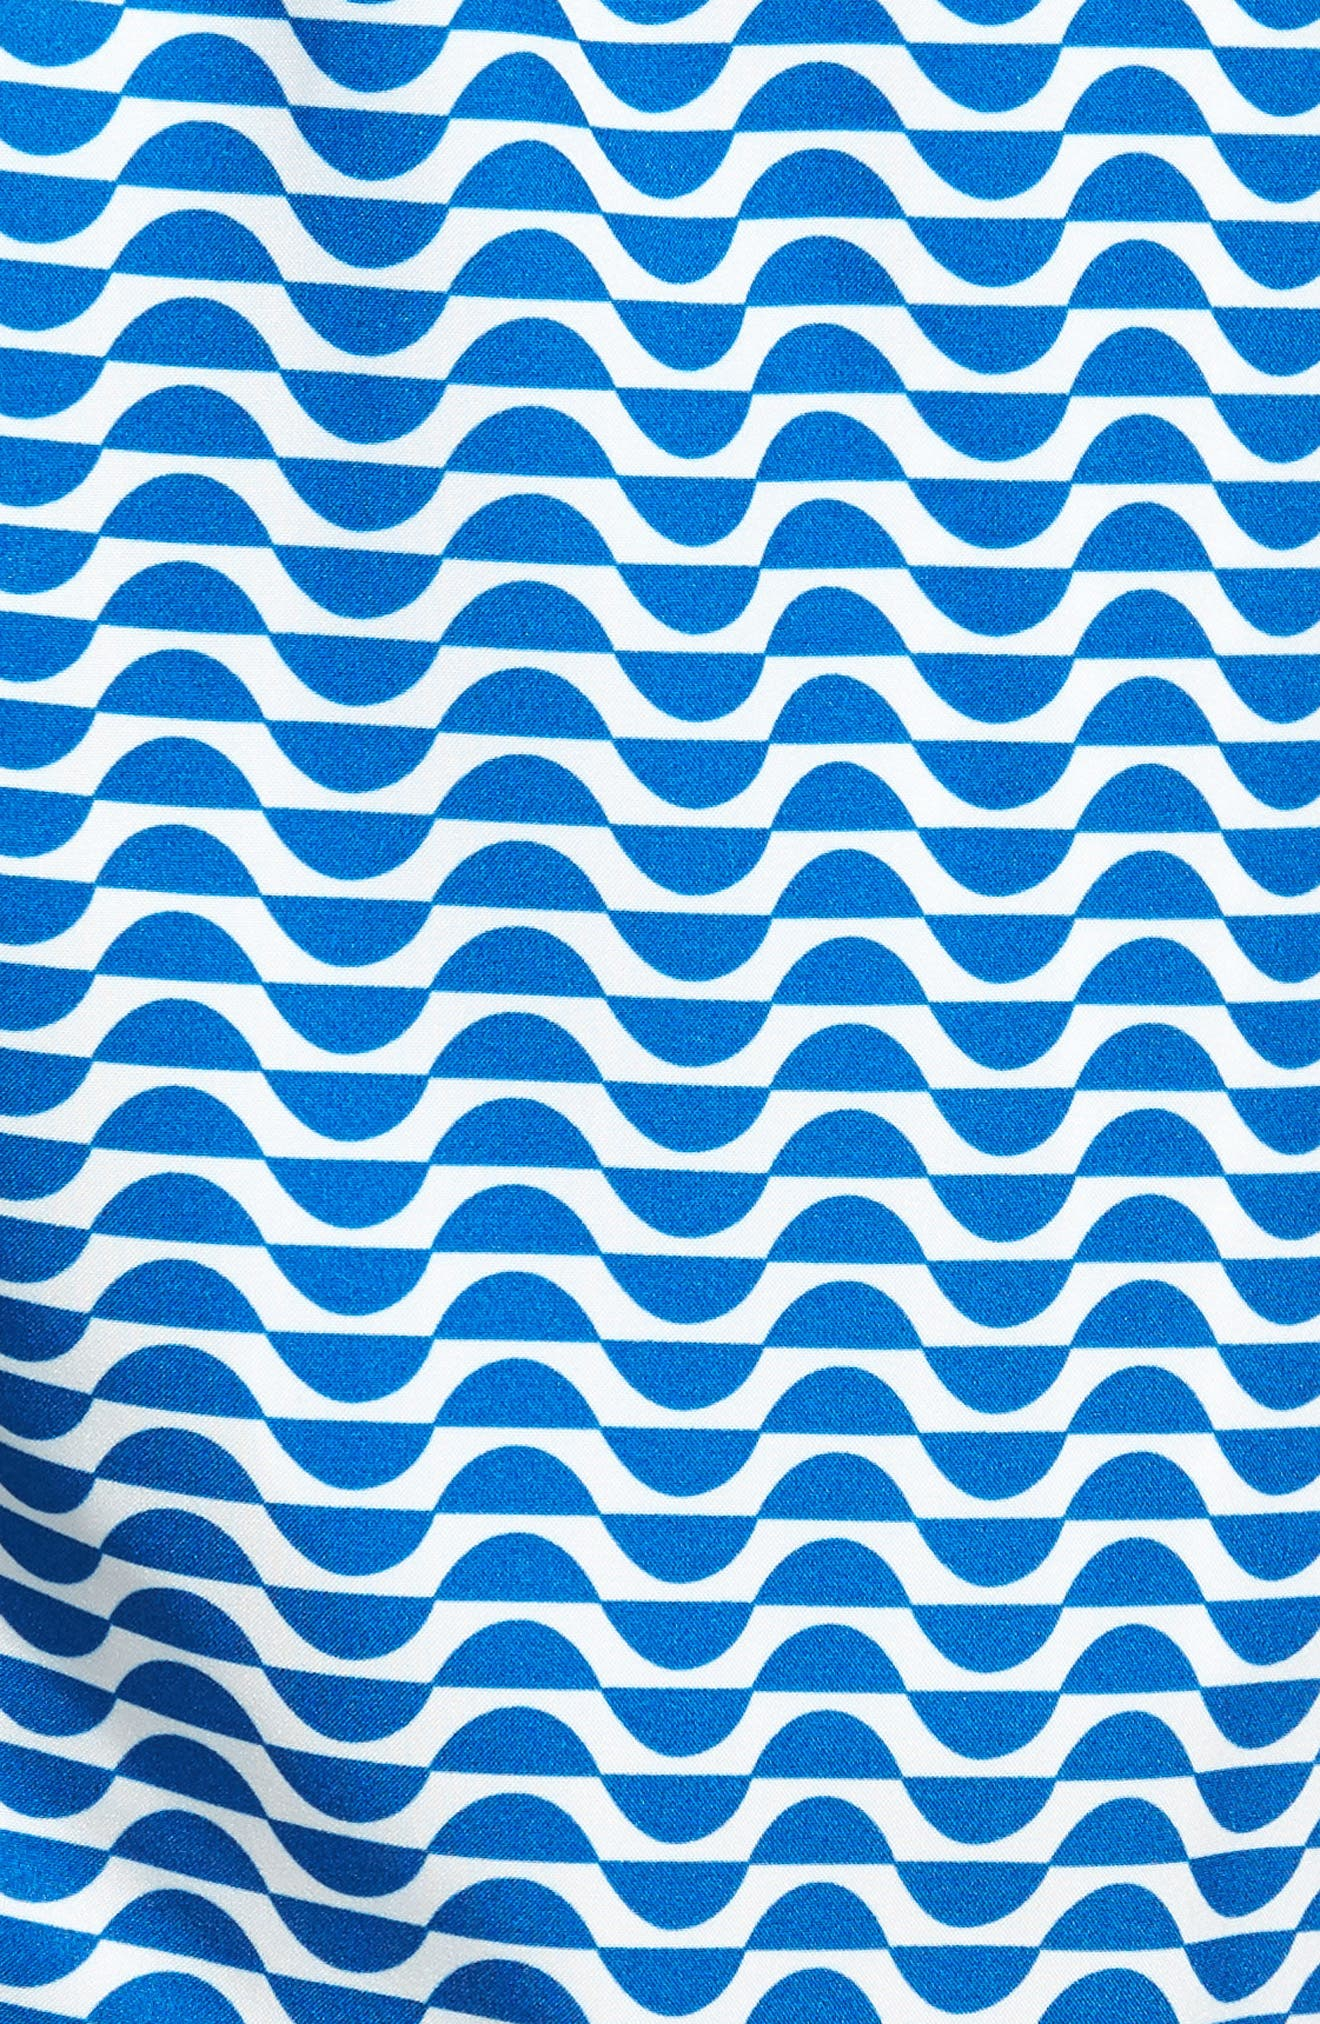 Banzai 7-Inch Swim Trunks,                             Alternate thumbnail 5, color,                             400